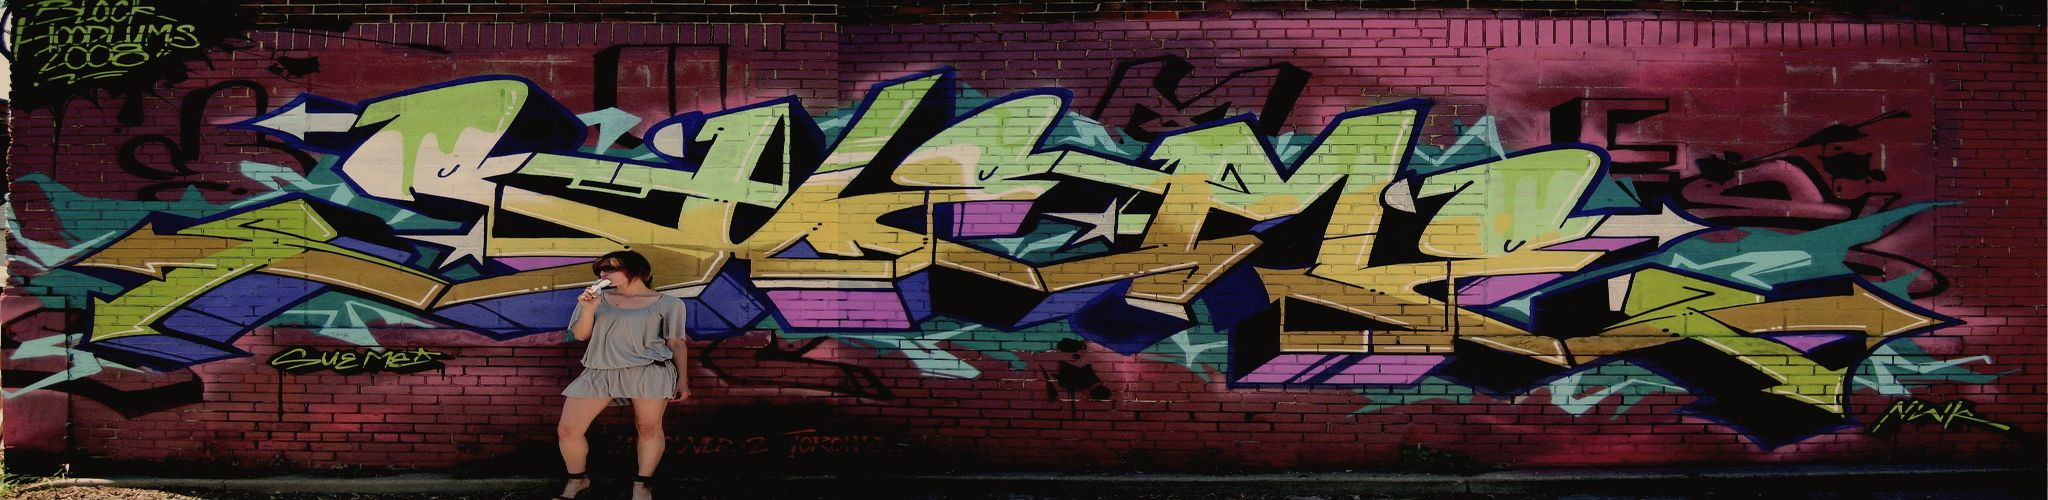 Artwork By Sueme in Toronto